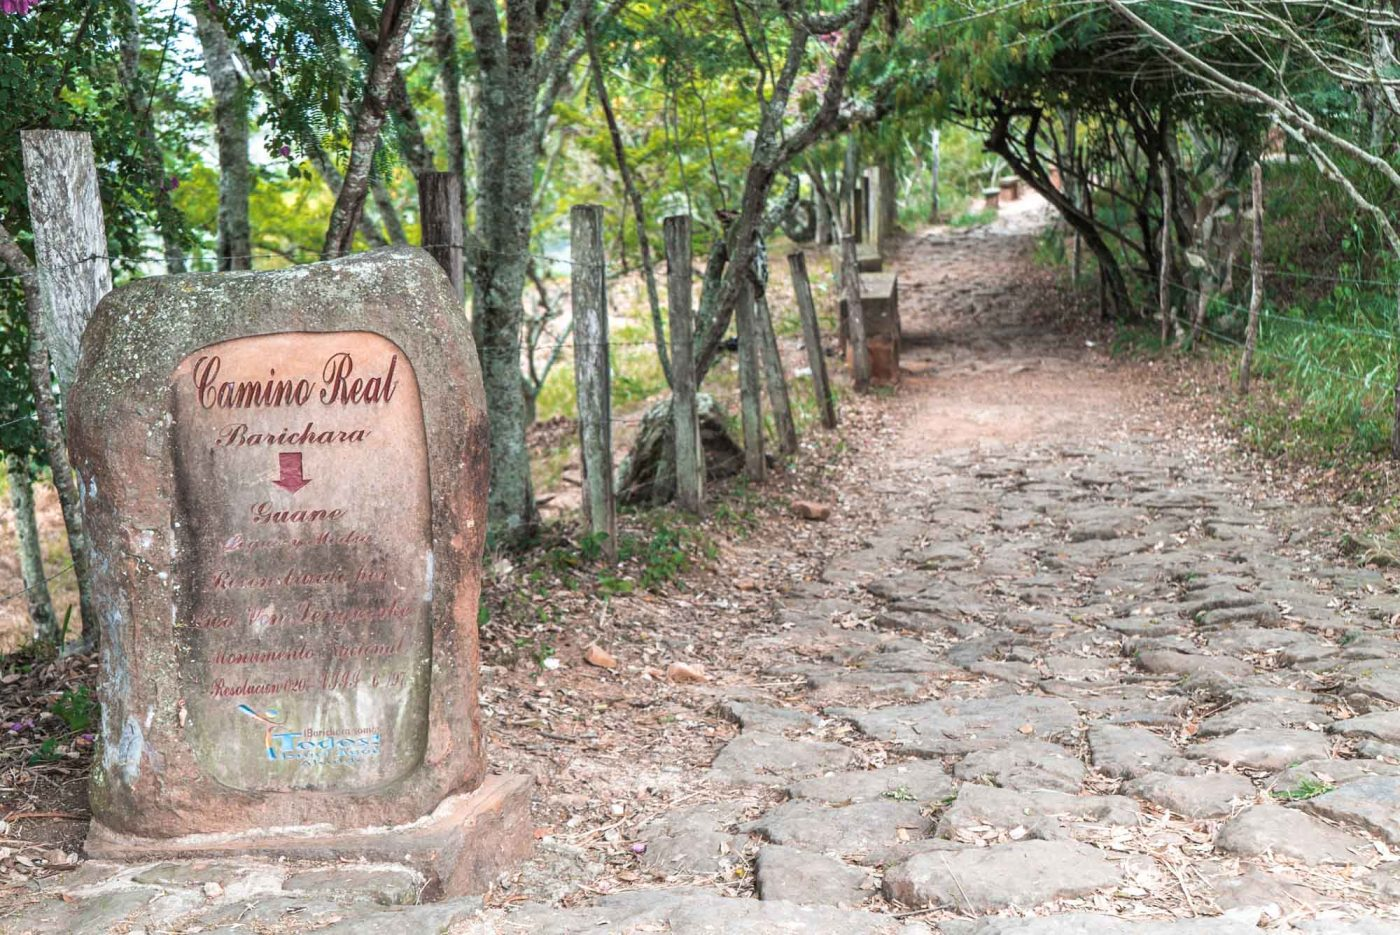 Camino Real trail, Barichara to Guane. San Gil, Colombia